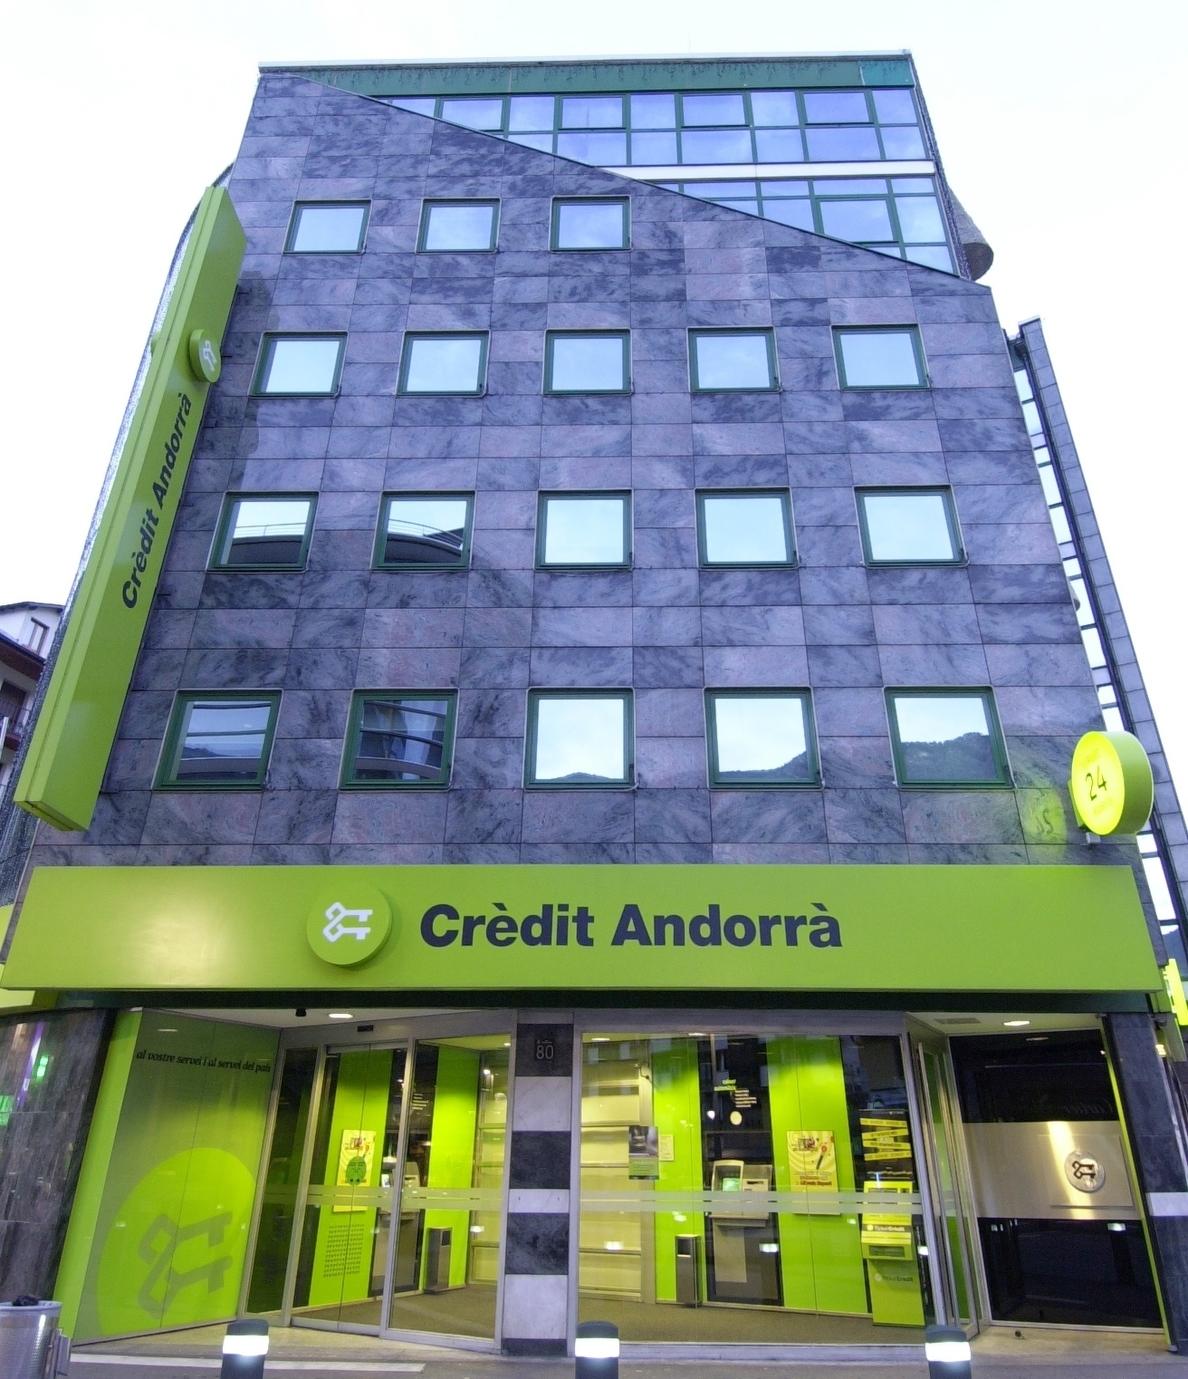 Crèdit Andorrà, el mejor banco de Andorra en banca privada de 2014